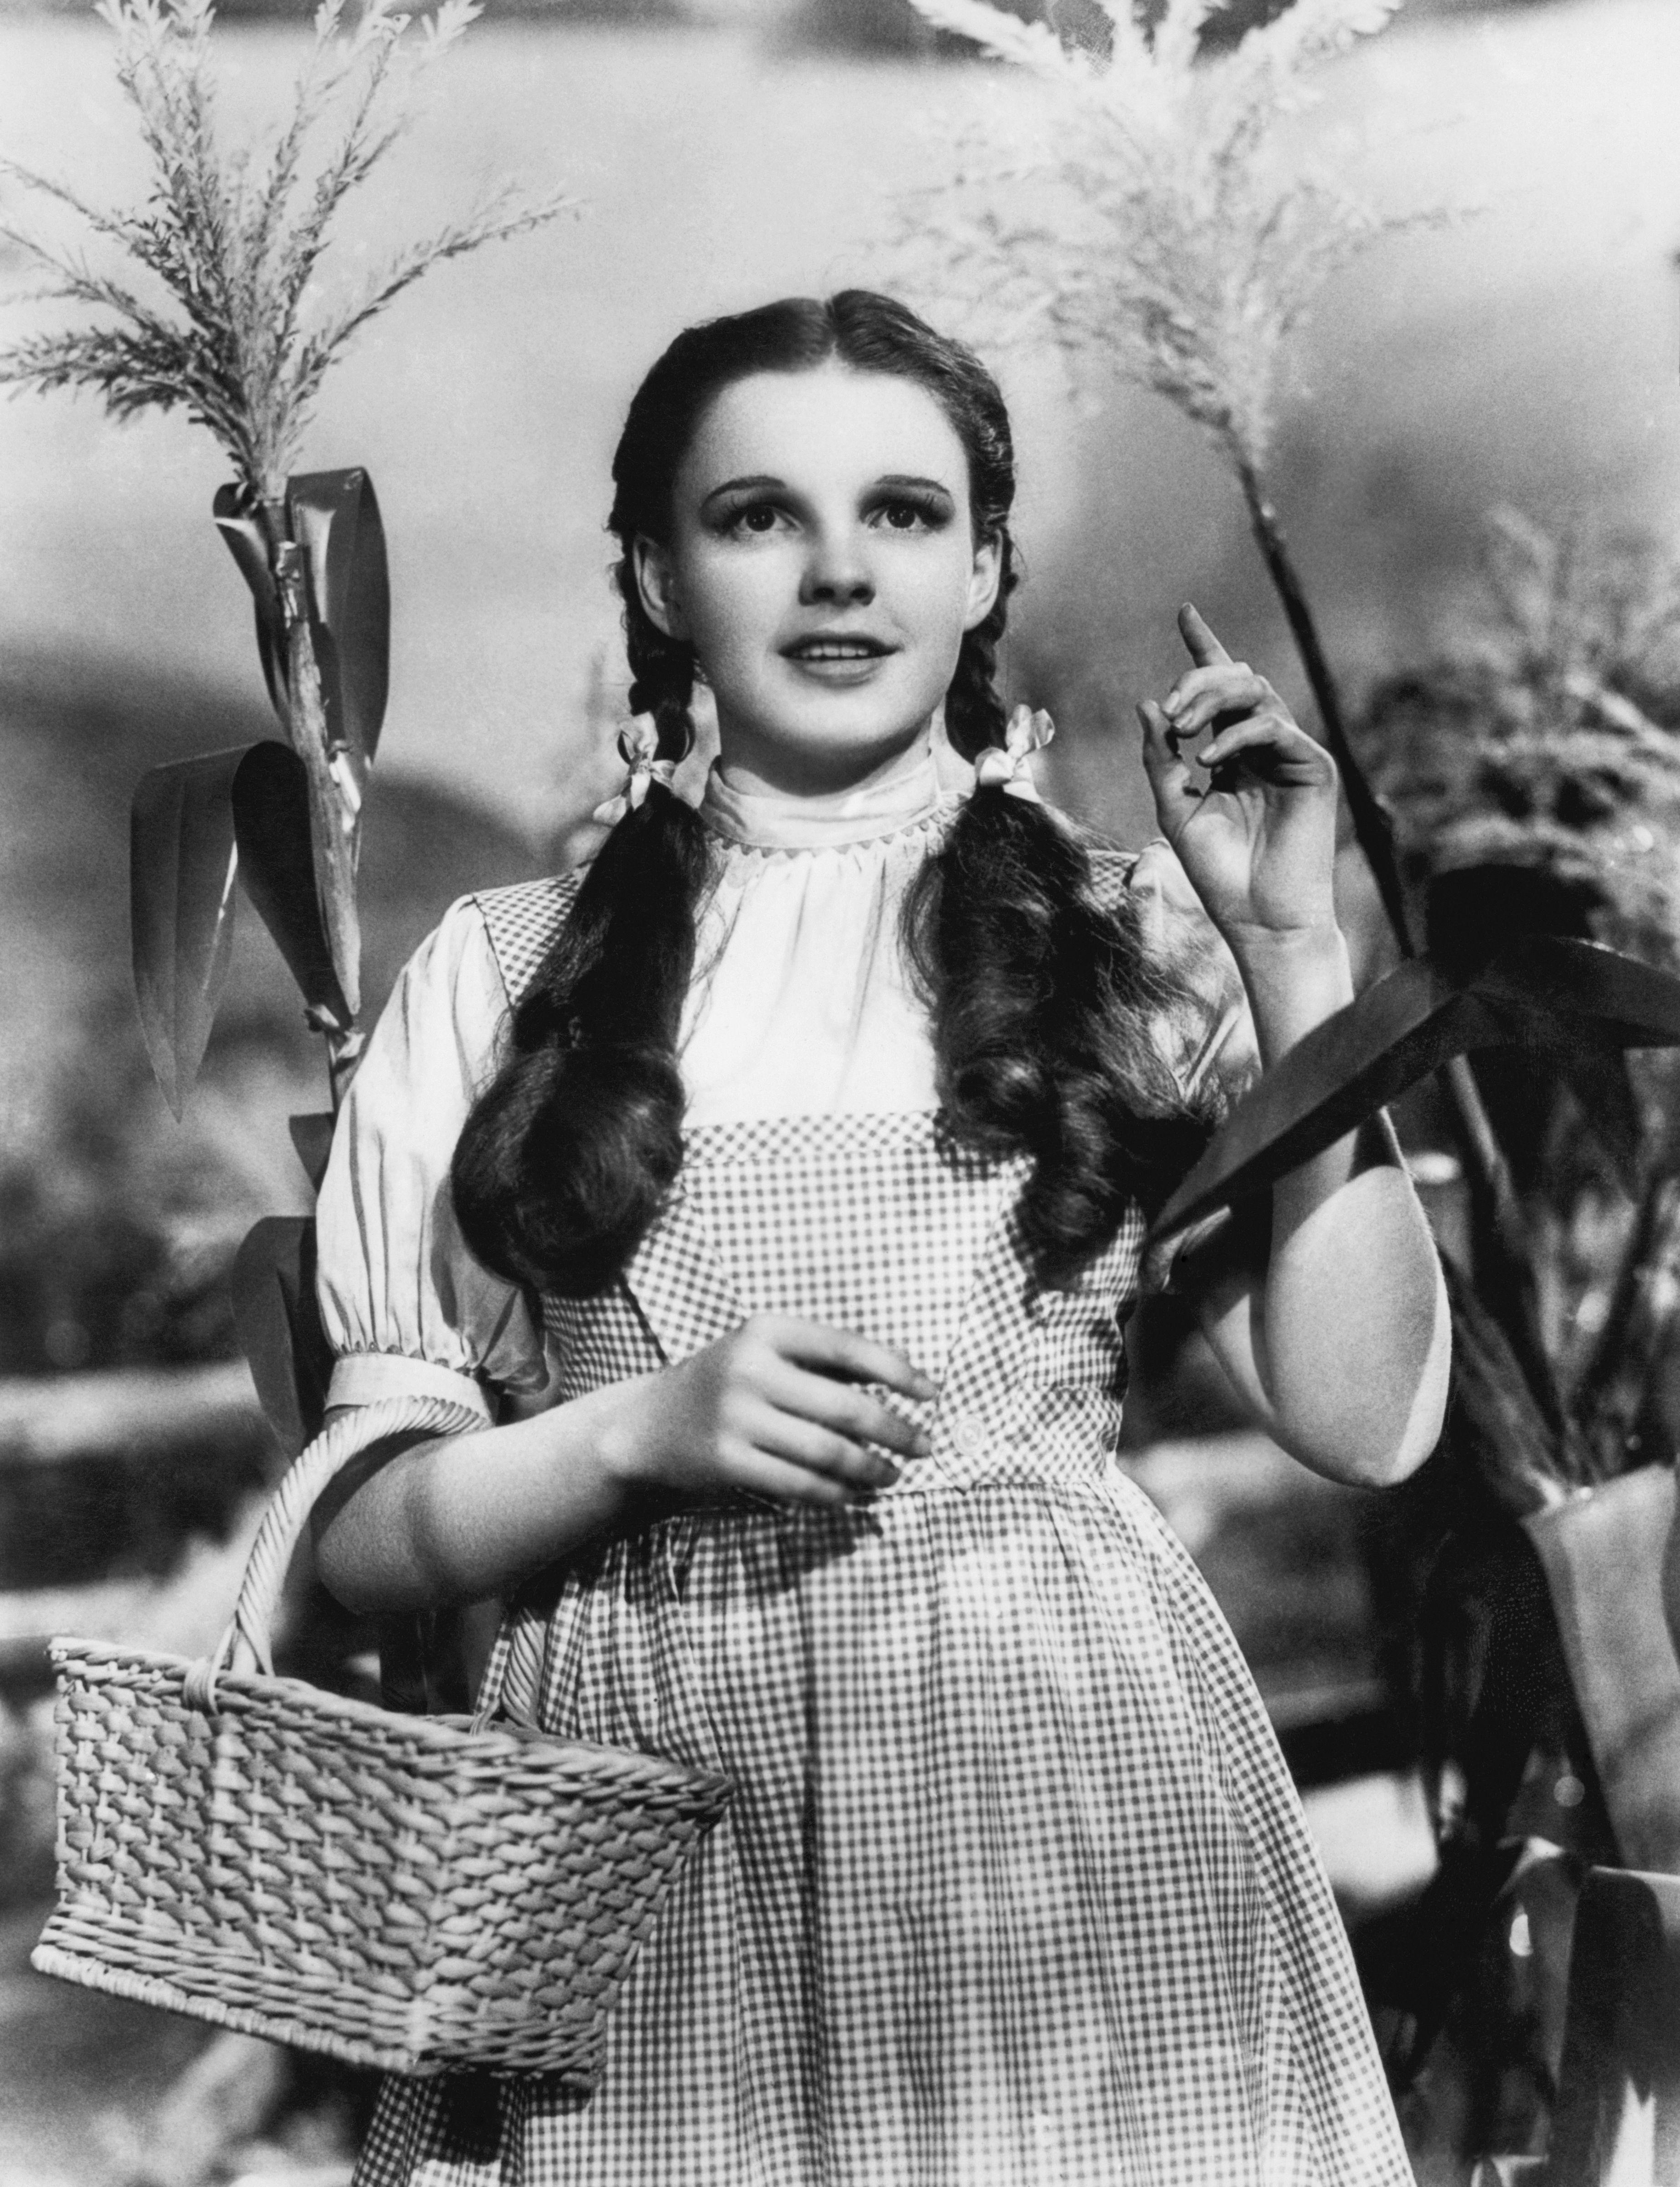 The Trendiest Hairstyle The Year You Were Born Wizard Of Oz Movie Judy Garland Oz Movie